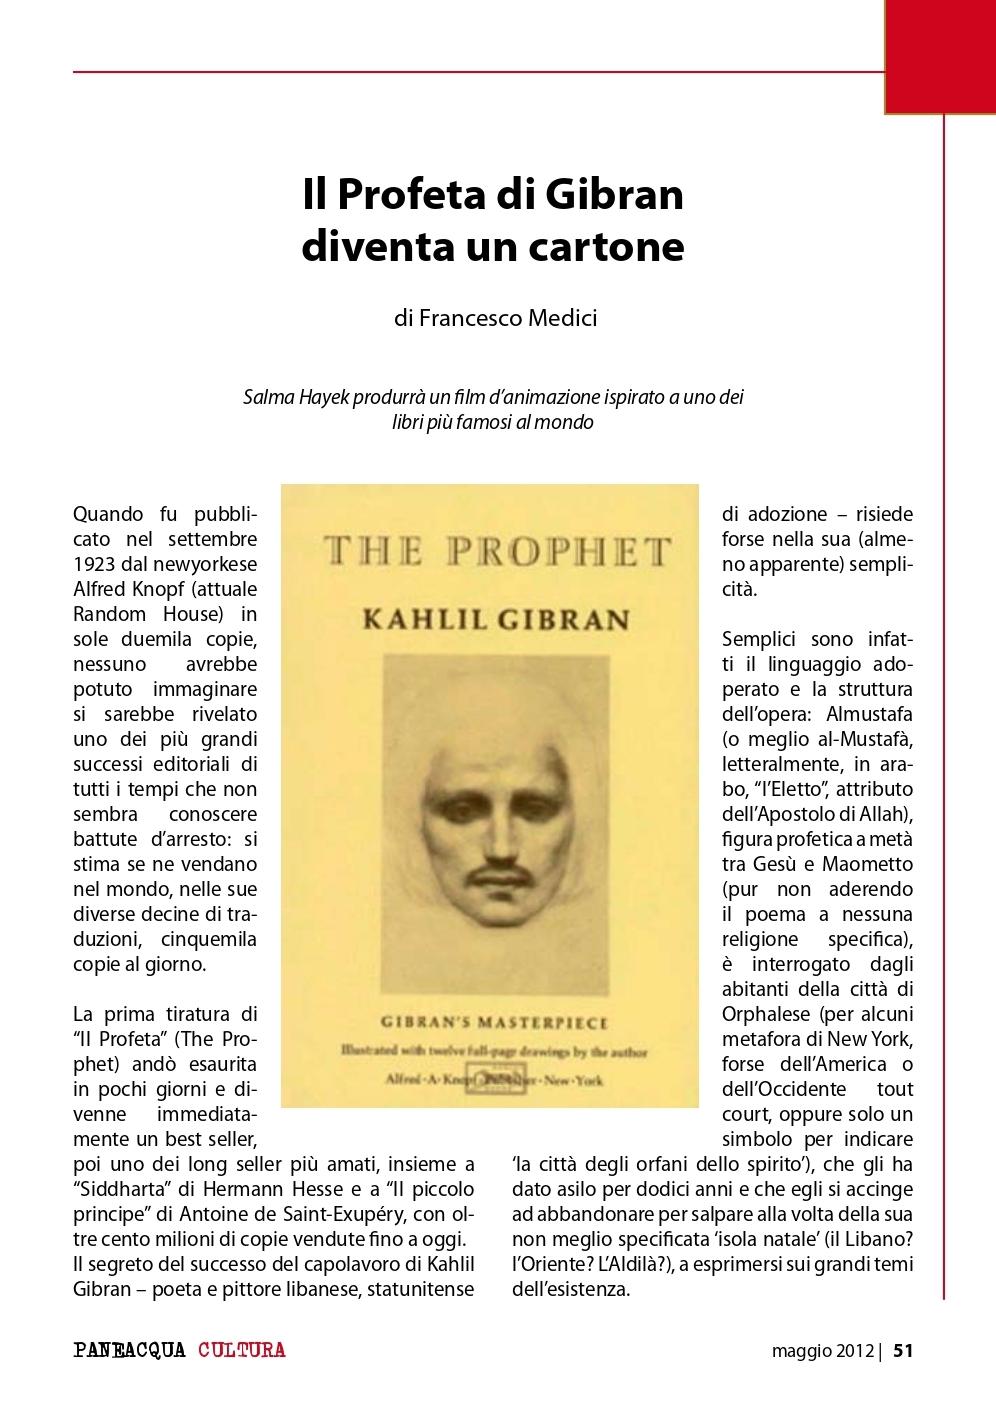 "Francesco Medici, ""Il Profeta"" di Gibran diventa un cartone, «Paneacqua», May 2012"